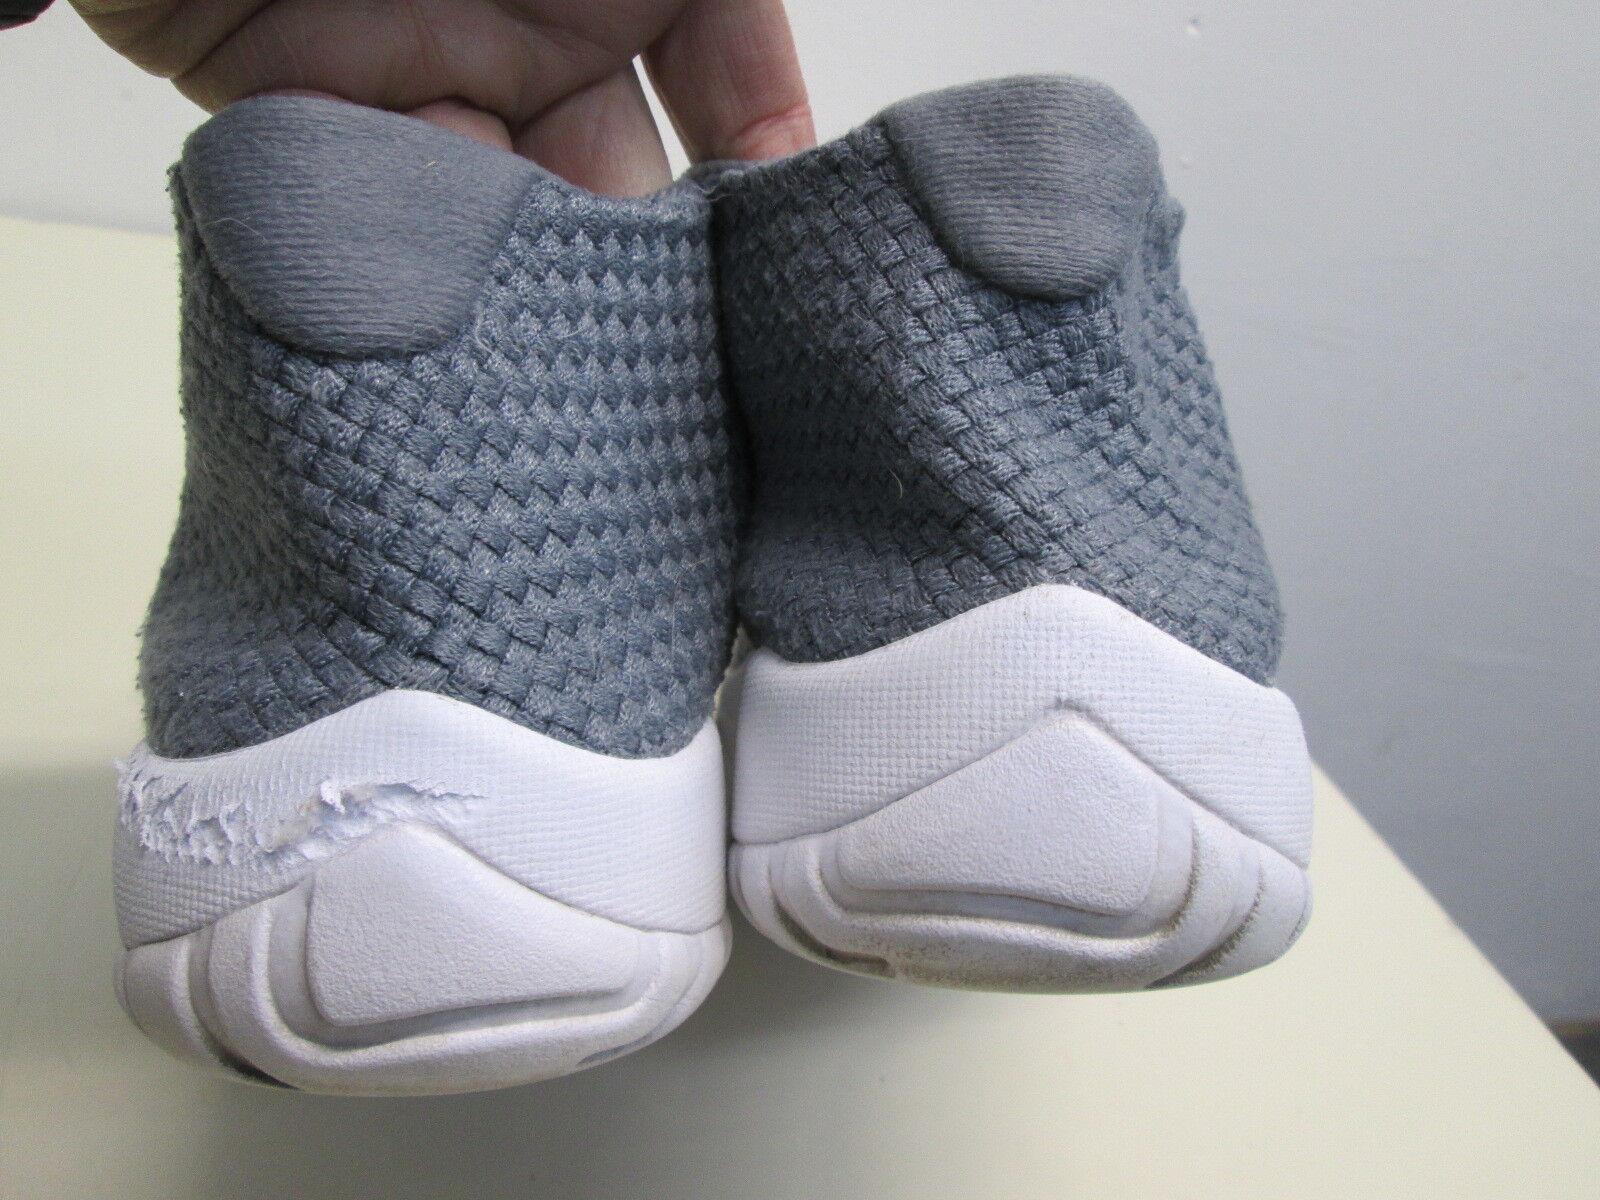 nike air jordan zukunft kühlen grau / weiß sz - 10 656503-003 wolle basketball - sz prämie 2d50bc